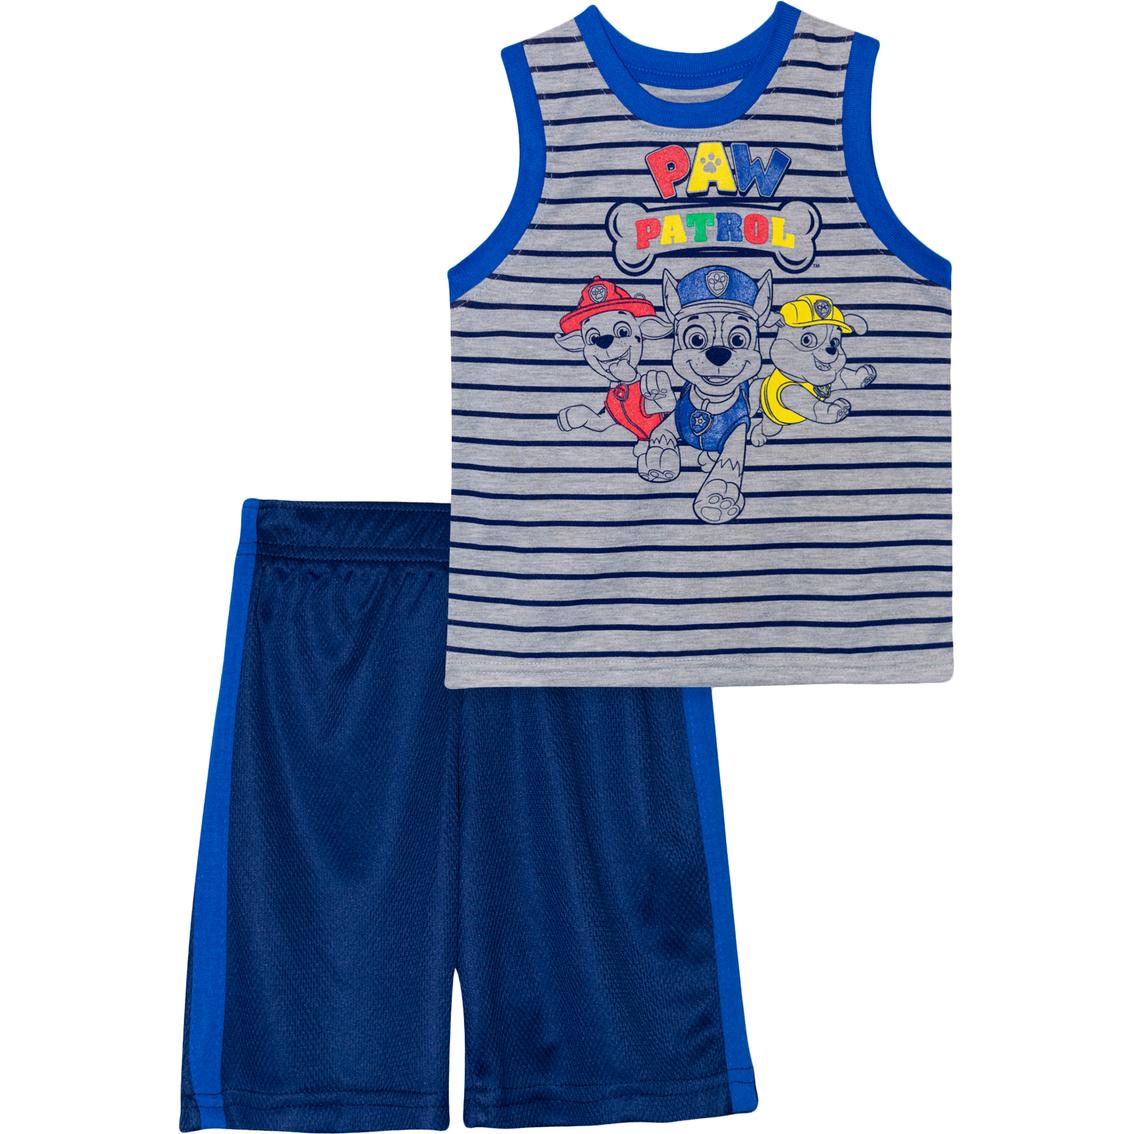 Toddler Boys PAW PATROL TANK TOP /& SHORTS SET Blue Green Aqua Plaid 2T 3T 4T 5T